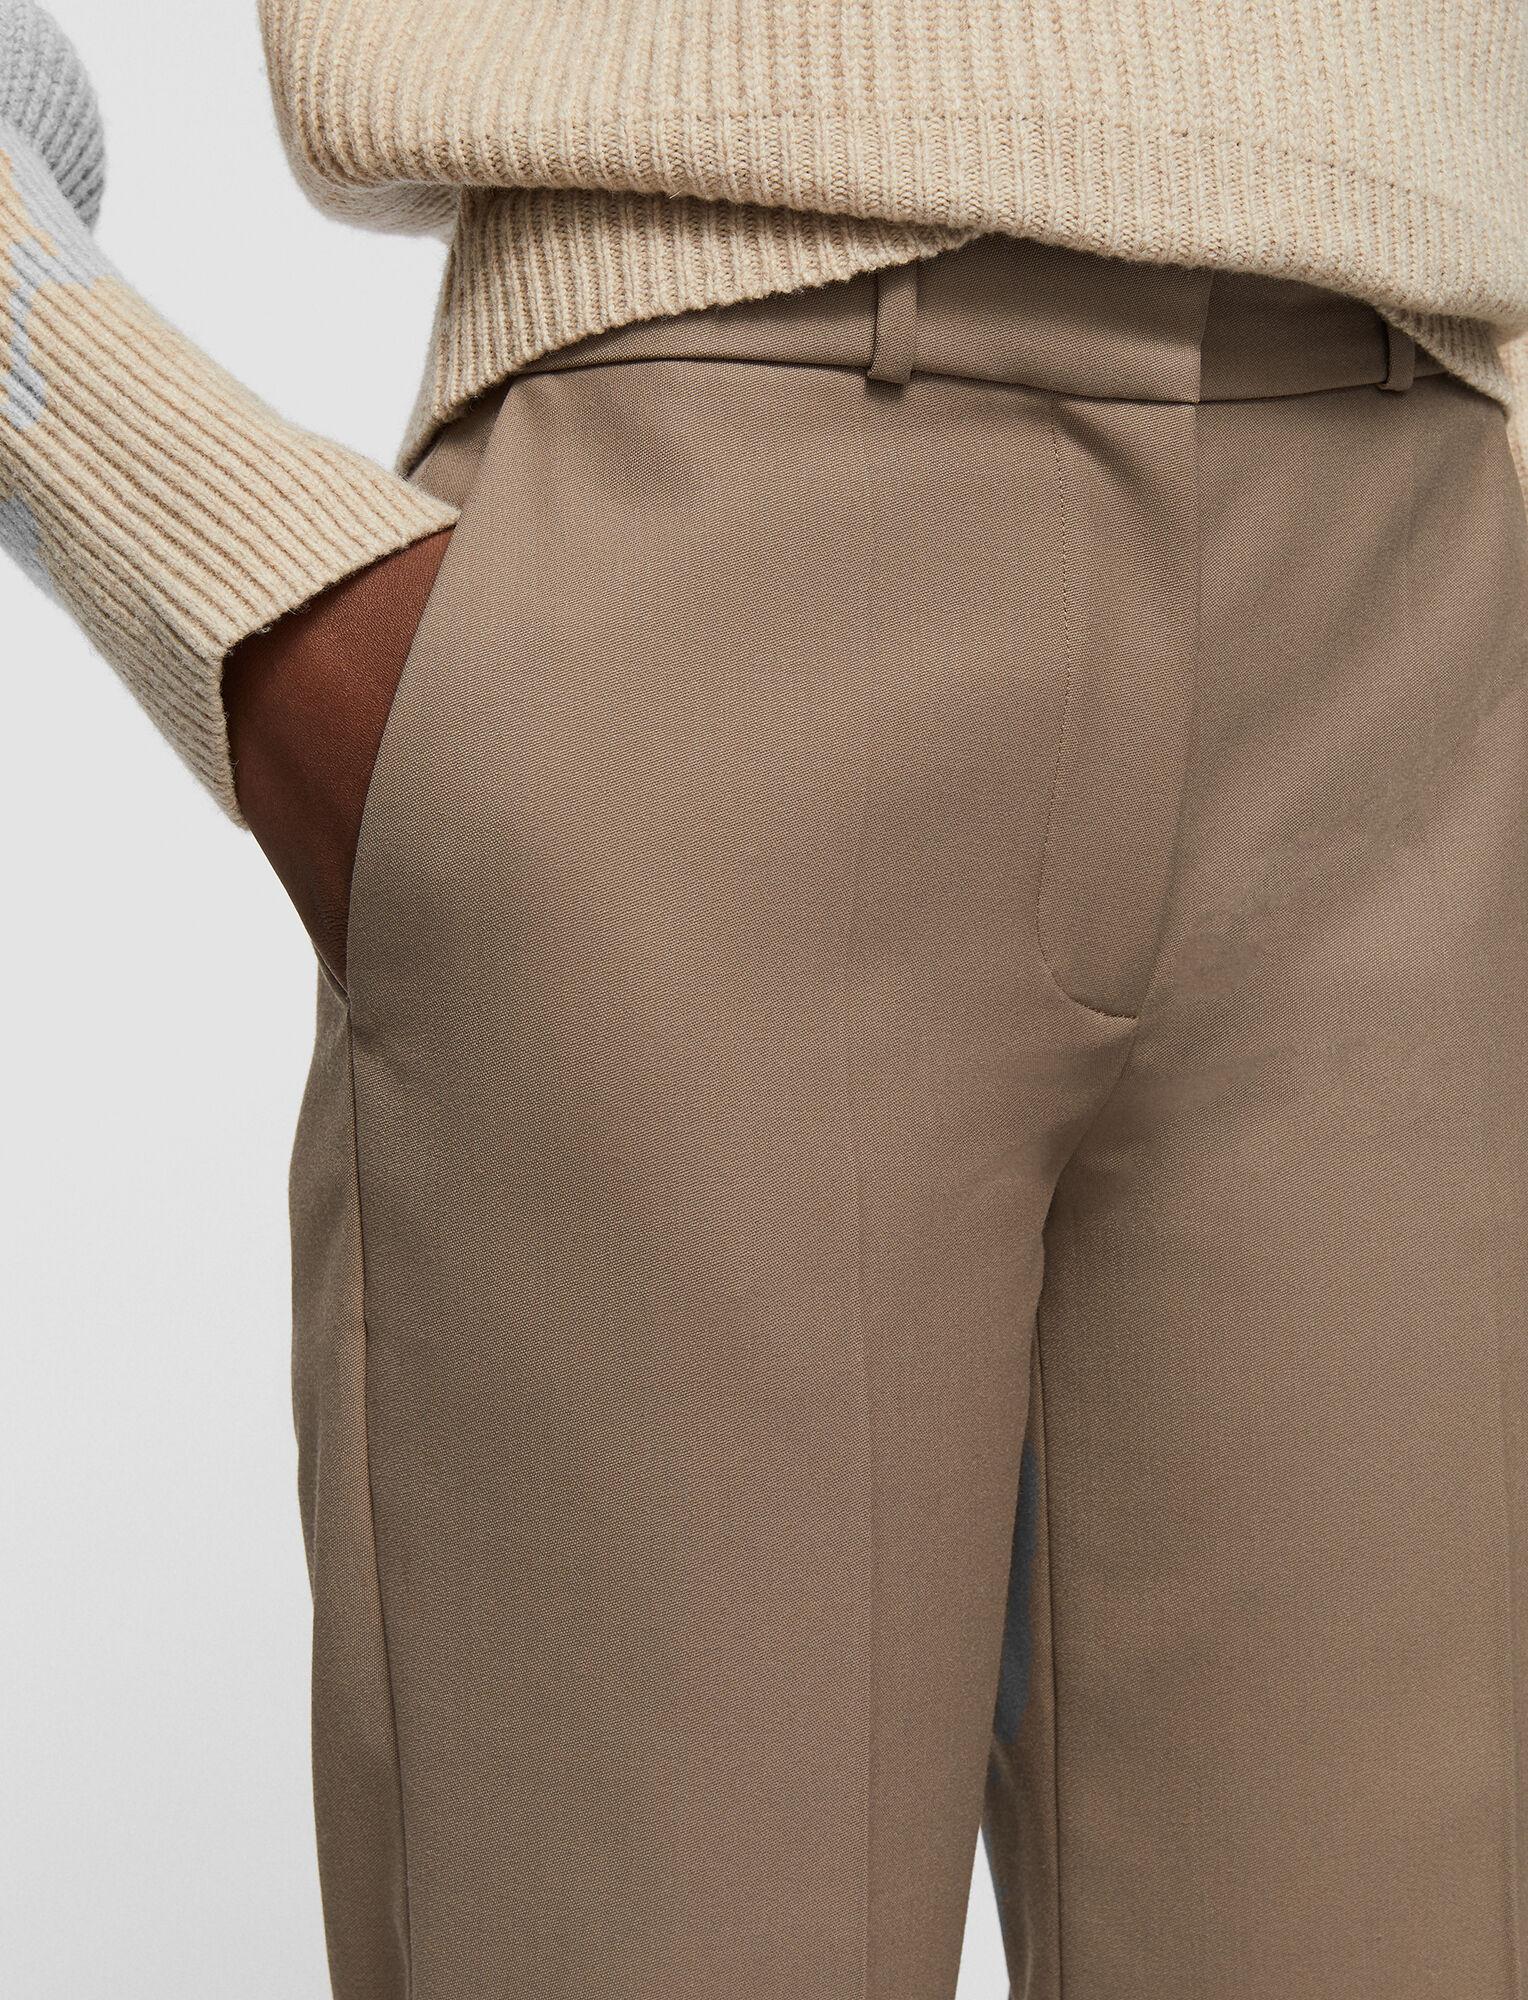 Joseph, Pantalon Morissey en laine douce granitée, in TAUPE